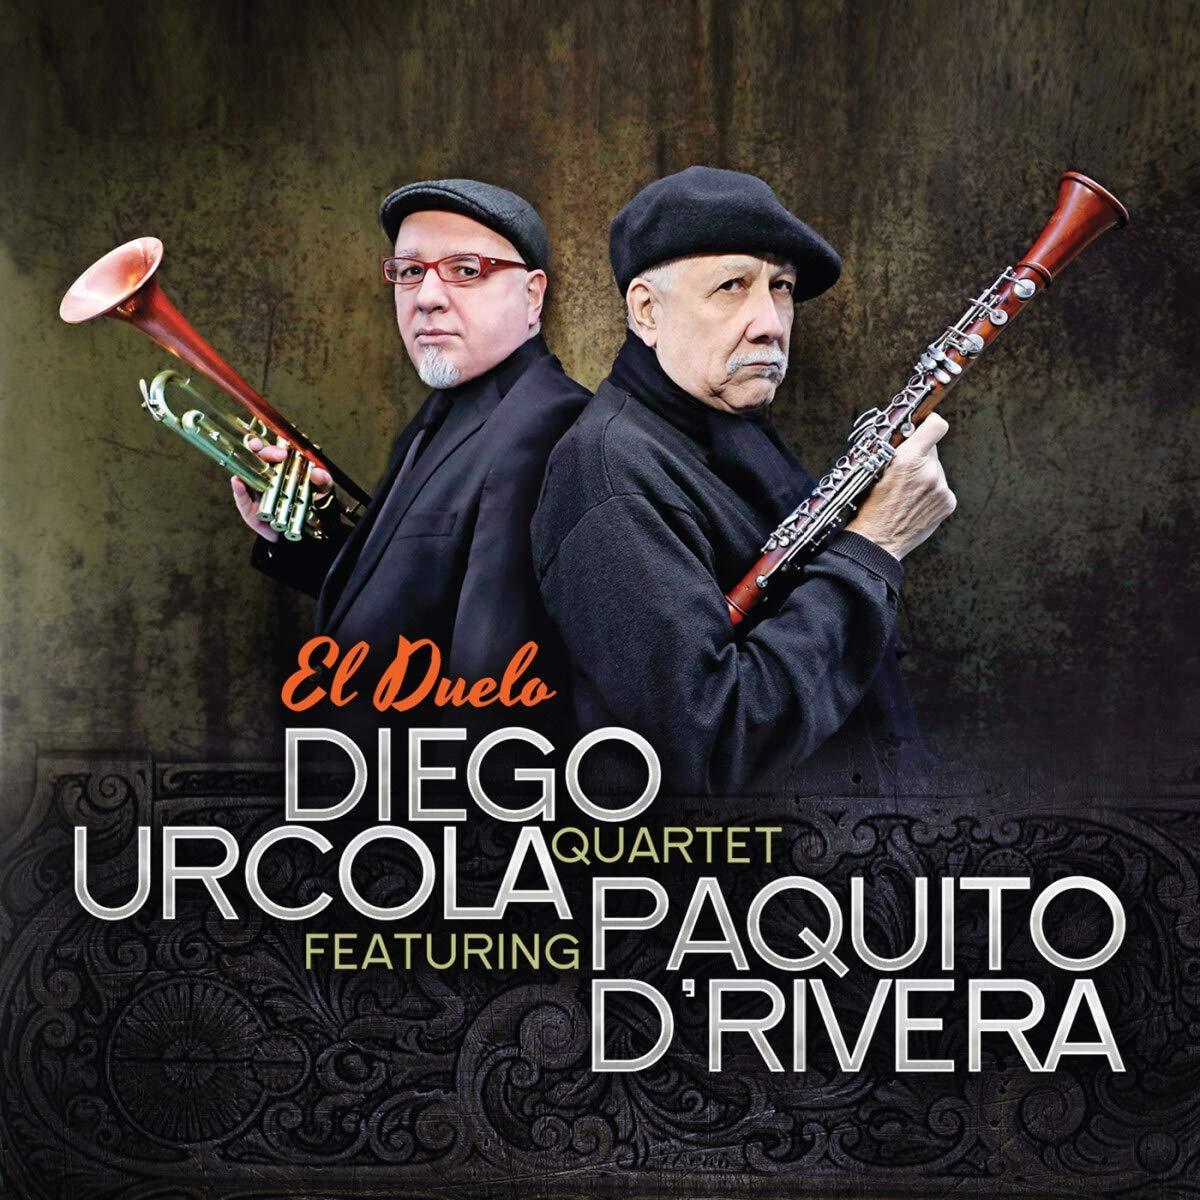 DIEGO URCOLA - Diego Urcola Quartet Featuring Paquito D'Rivera : El Duelo cover